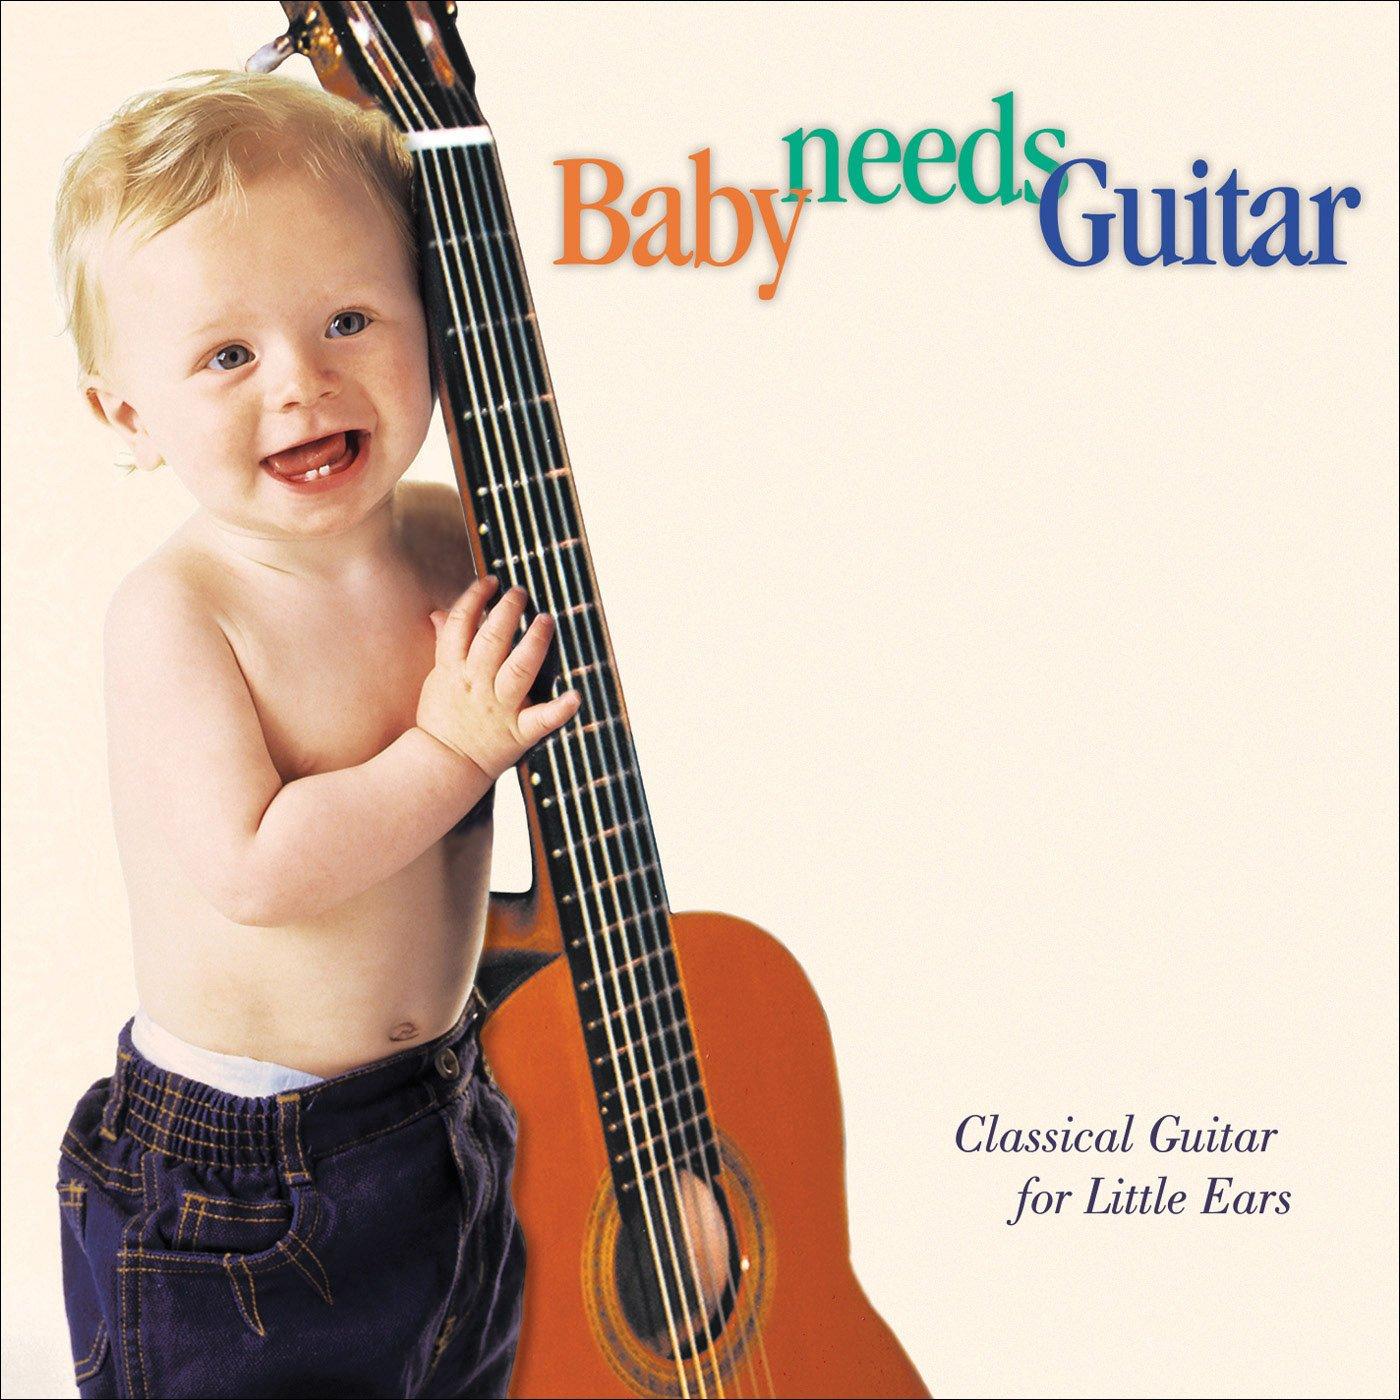 Baby Needs High material Guitar: Class Product Little Ears Guitar Various